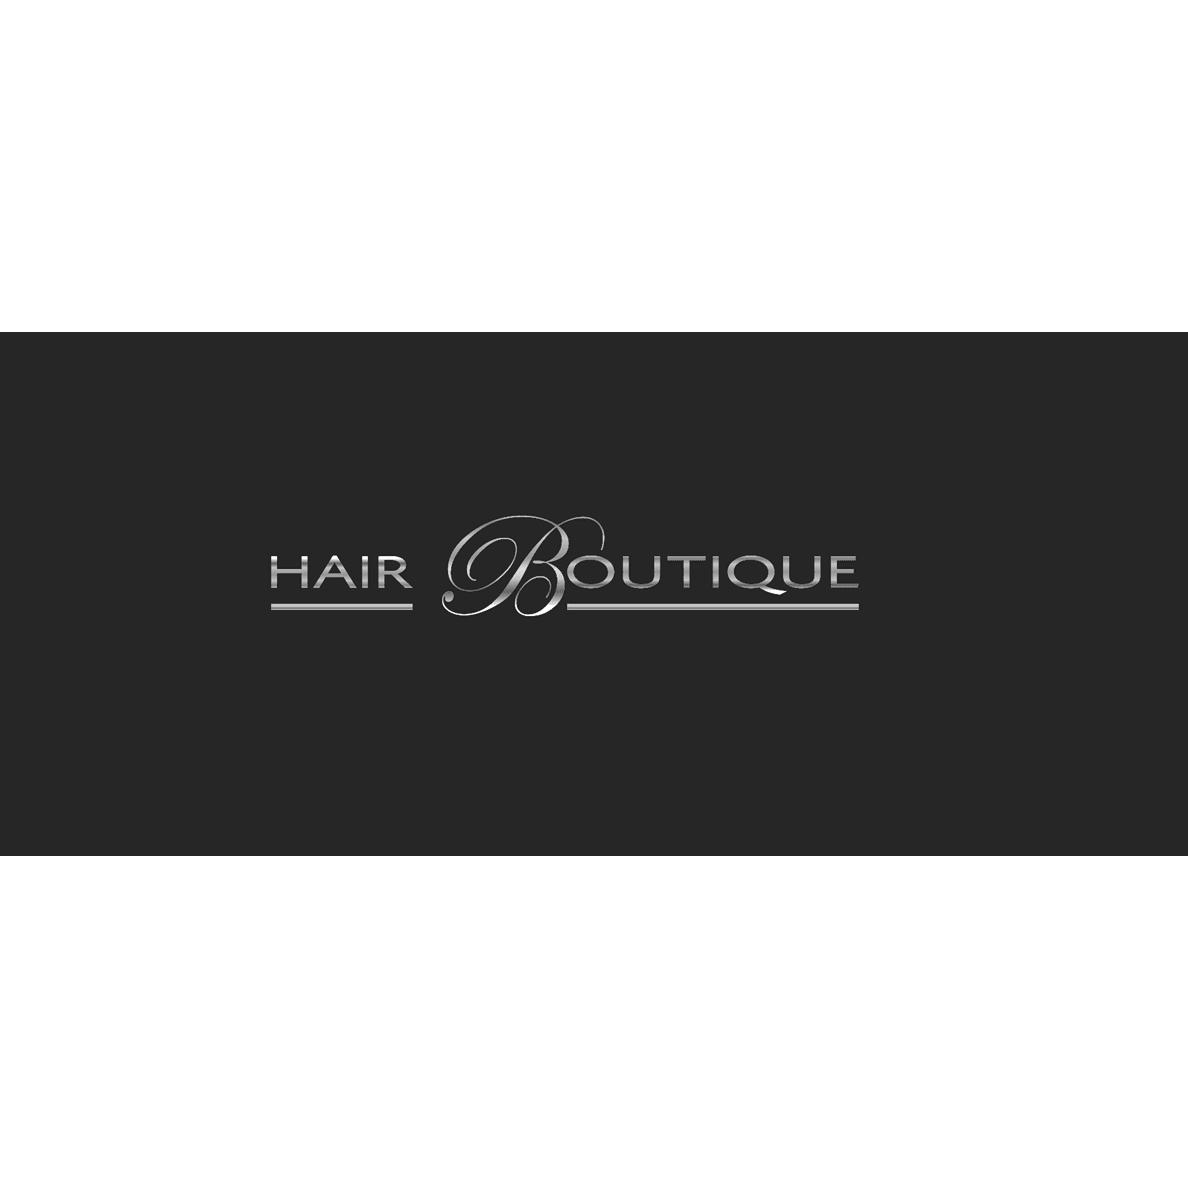 Hair Boutique - Yateley, Hampshire GU46 7TJ - 01252 872167 | ShowMeLocal.com